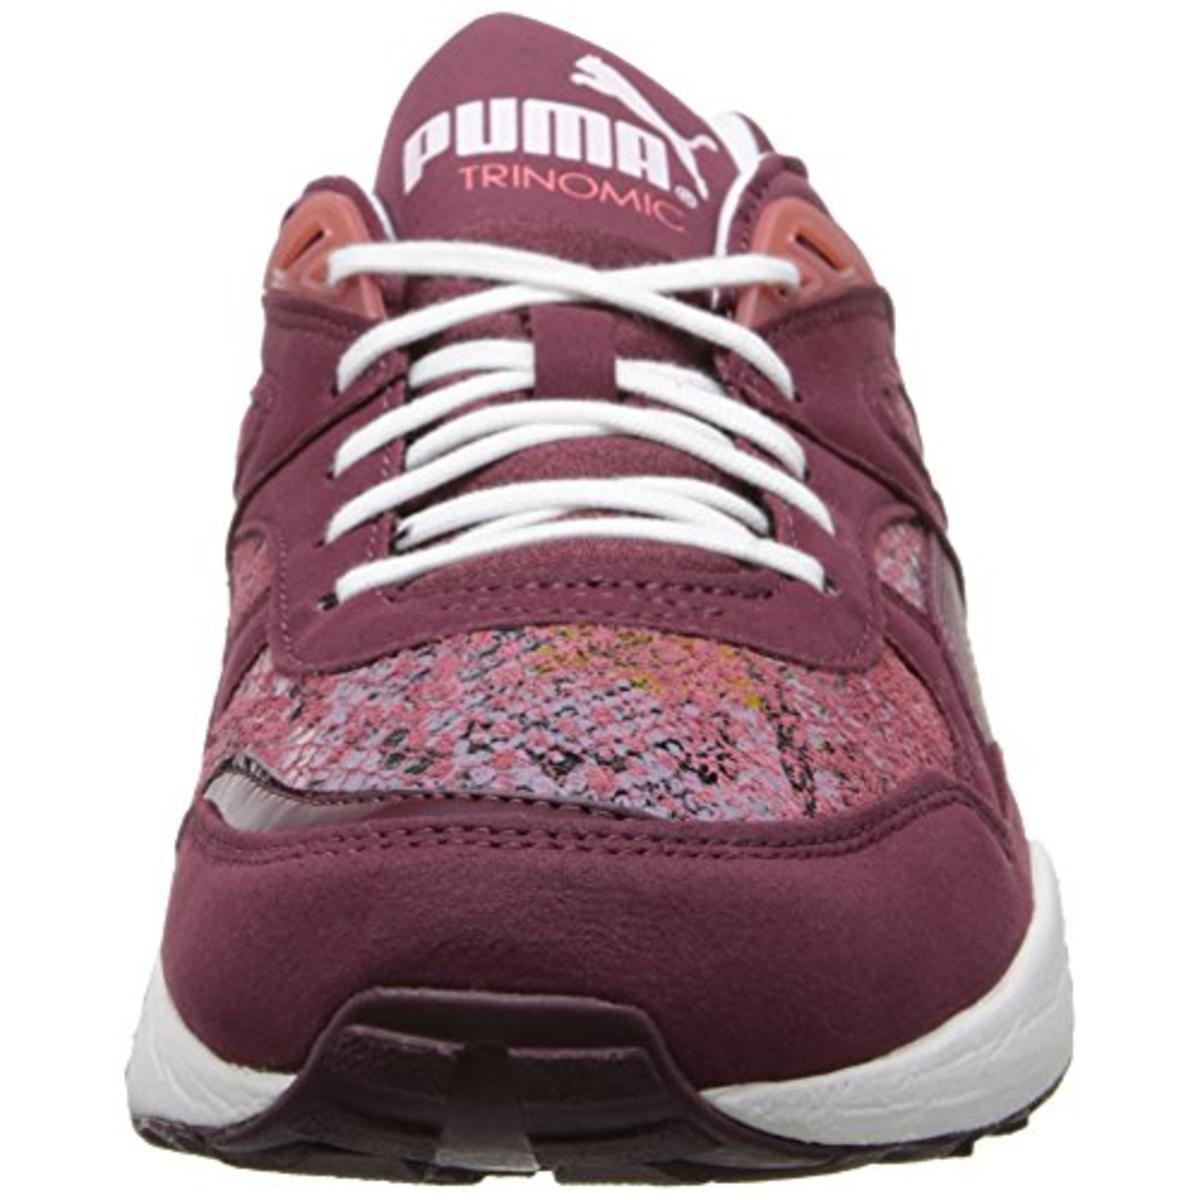 PUMA - puma womens trinomic r698 hype leather snake print athletic shoes -  Walmart.com 7cd1202c5